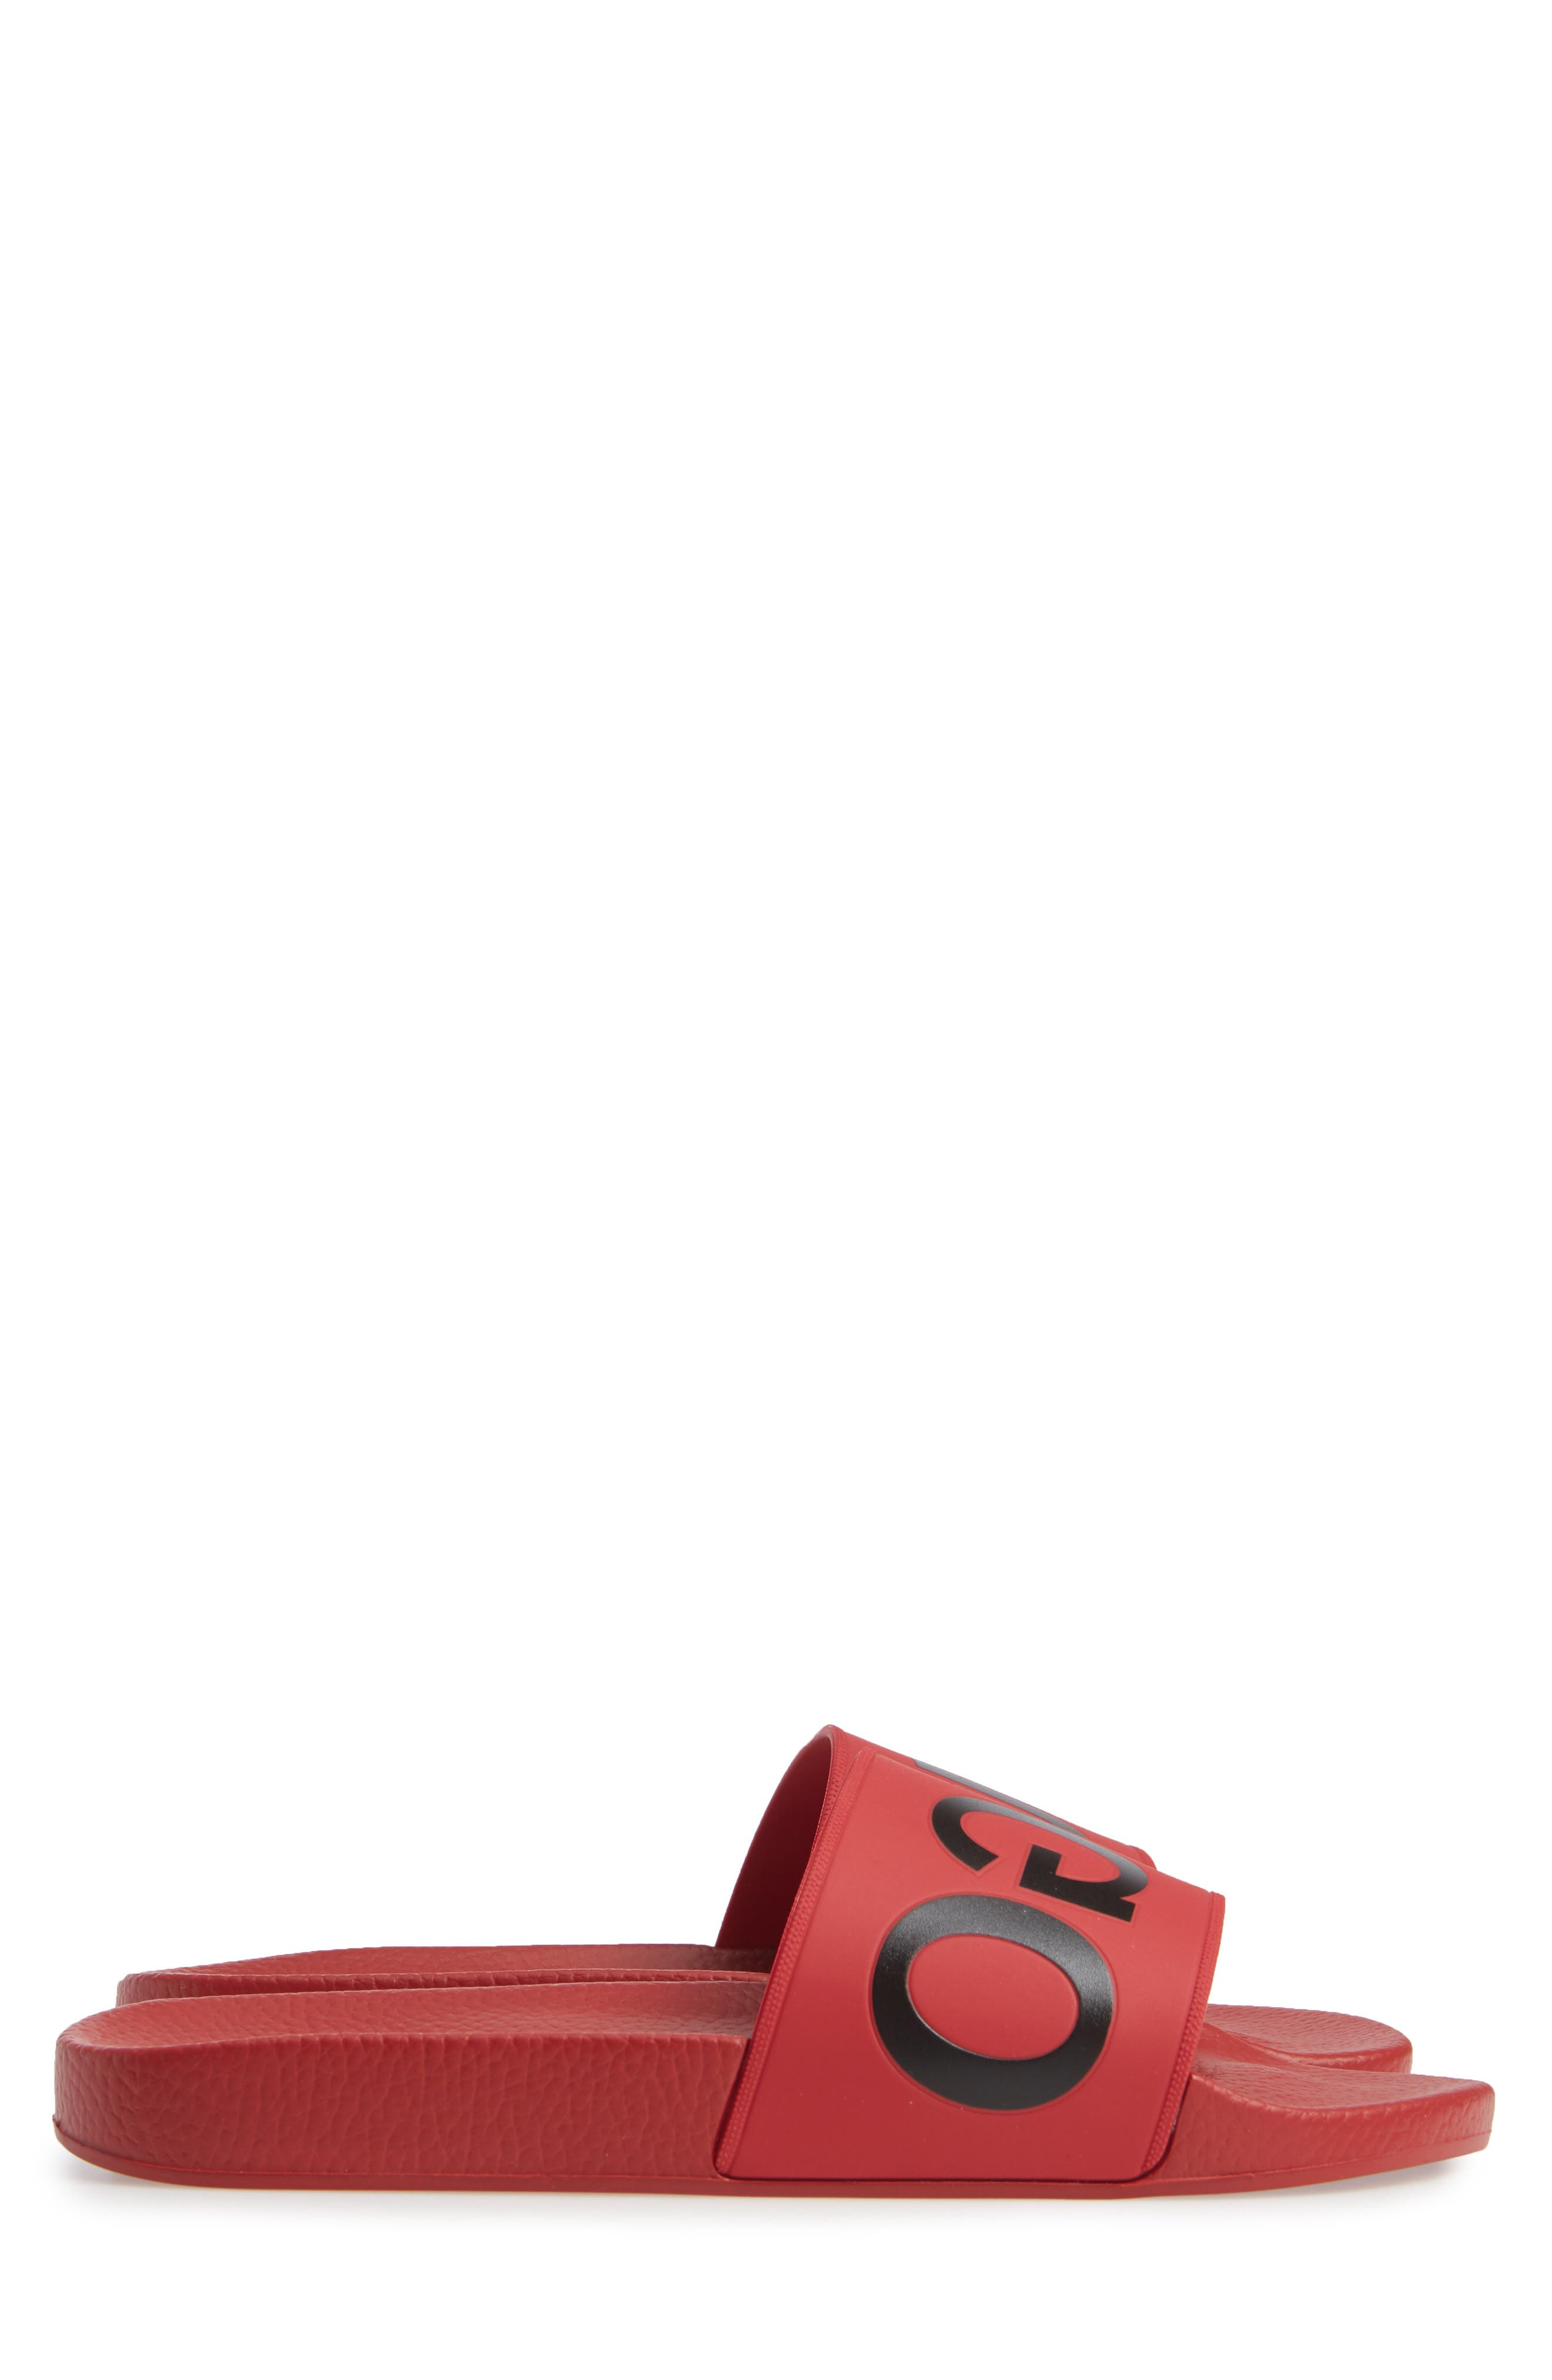 Time Out Slide Sandal,                             Alternate thumbnail 3, color,                             MEDIUM RED